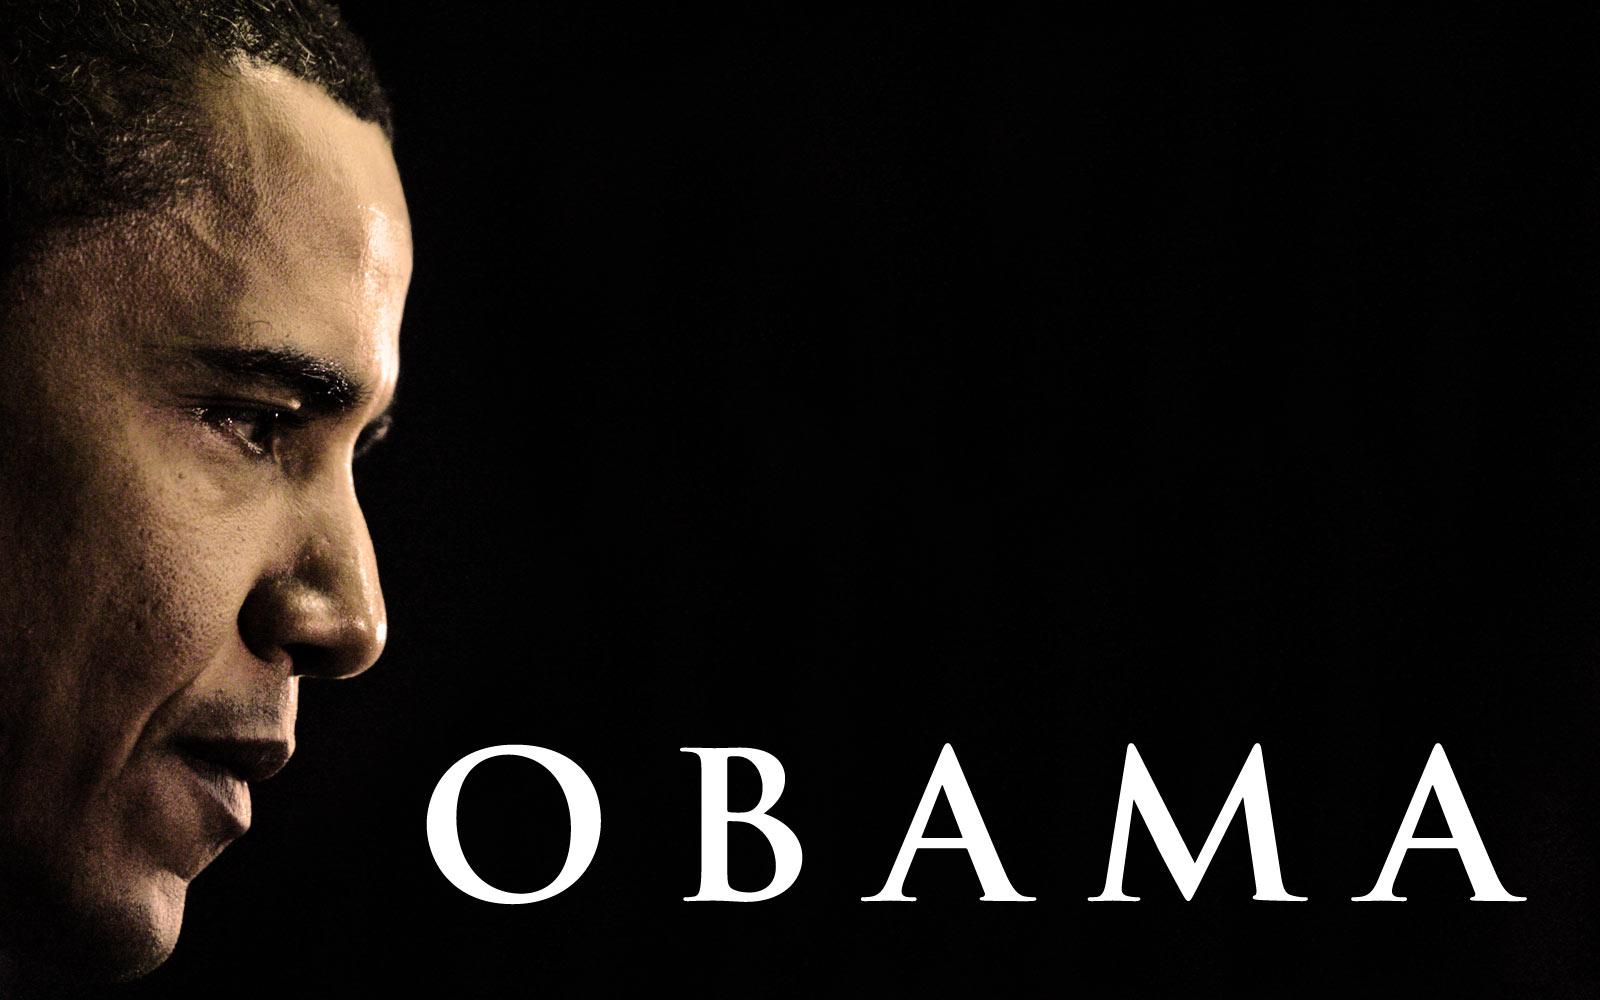 Barack Obama HD Wallpapers 1600x1000